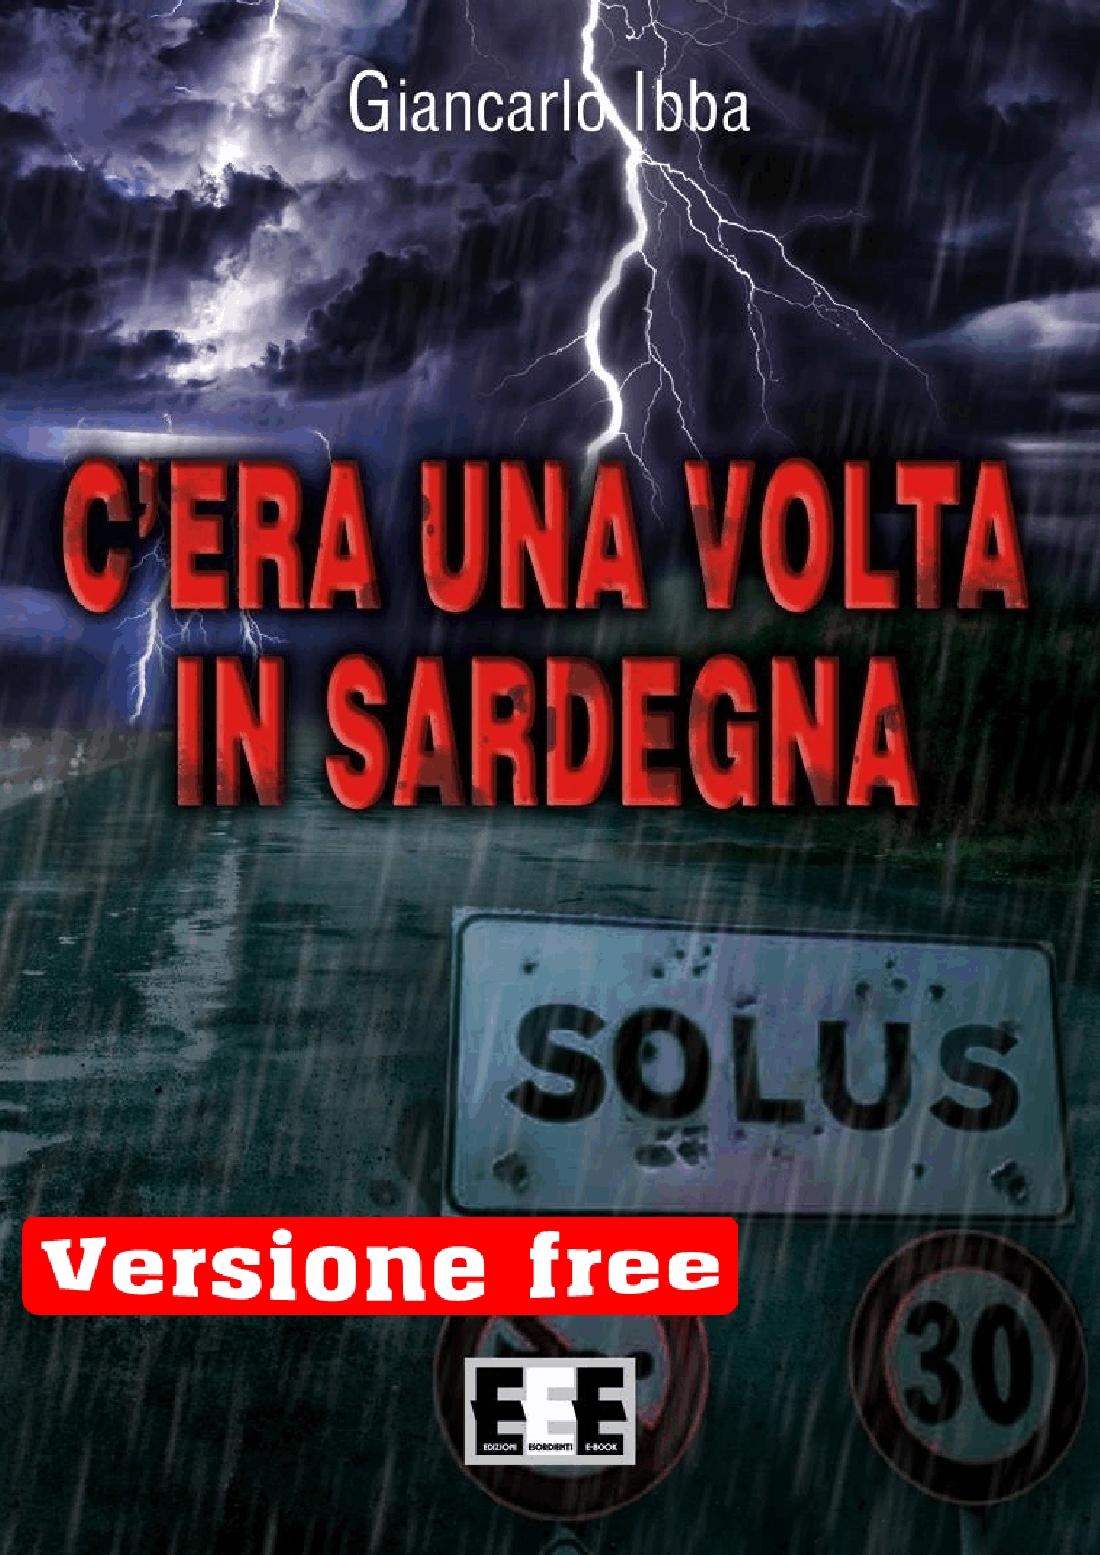 COVER_SARDEGNA_FREE